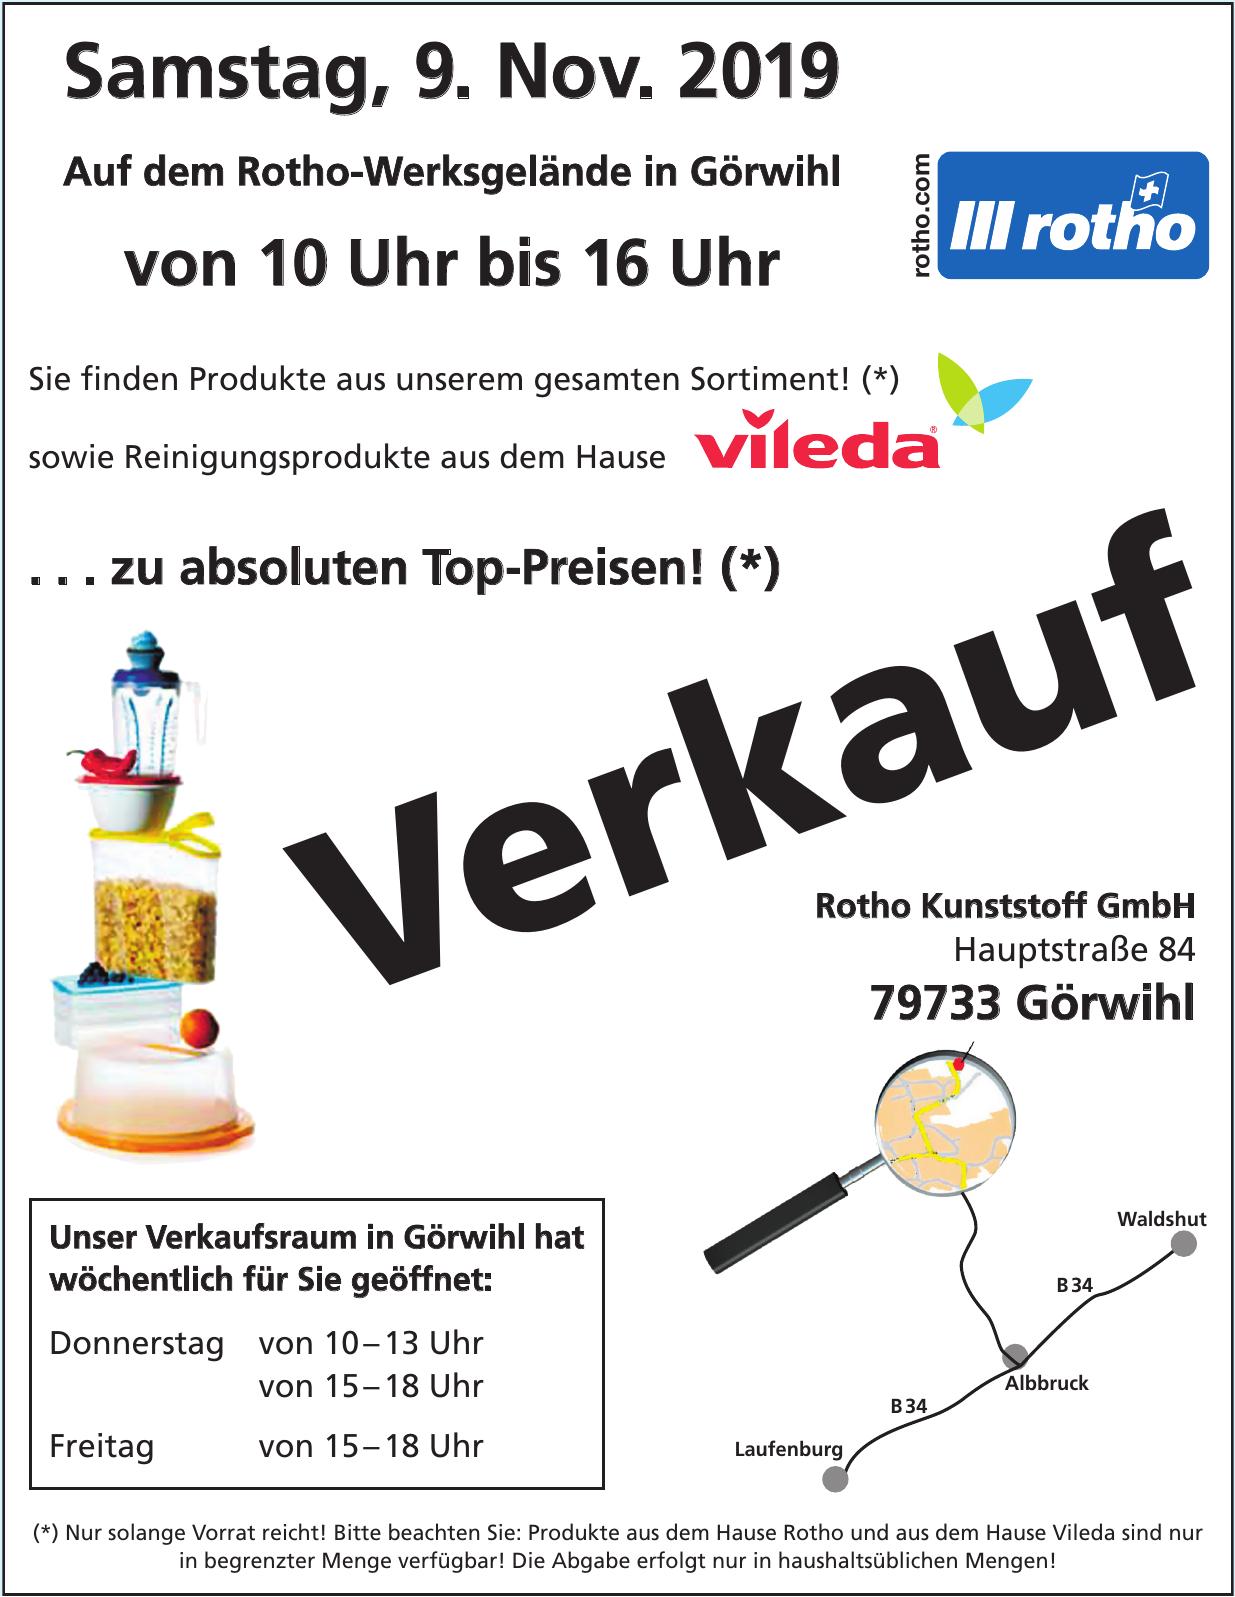 Rotho Kunststoff GmbH